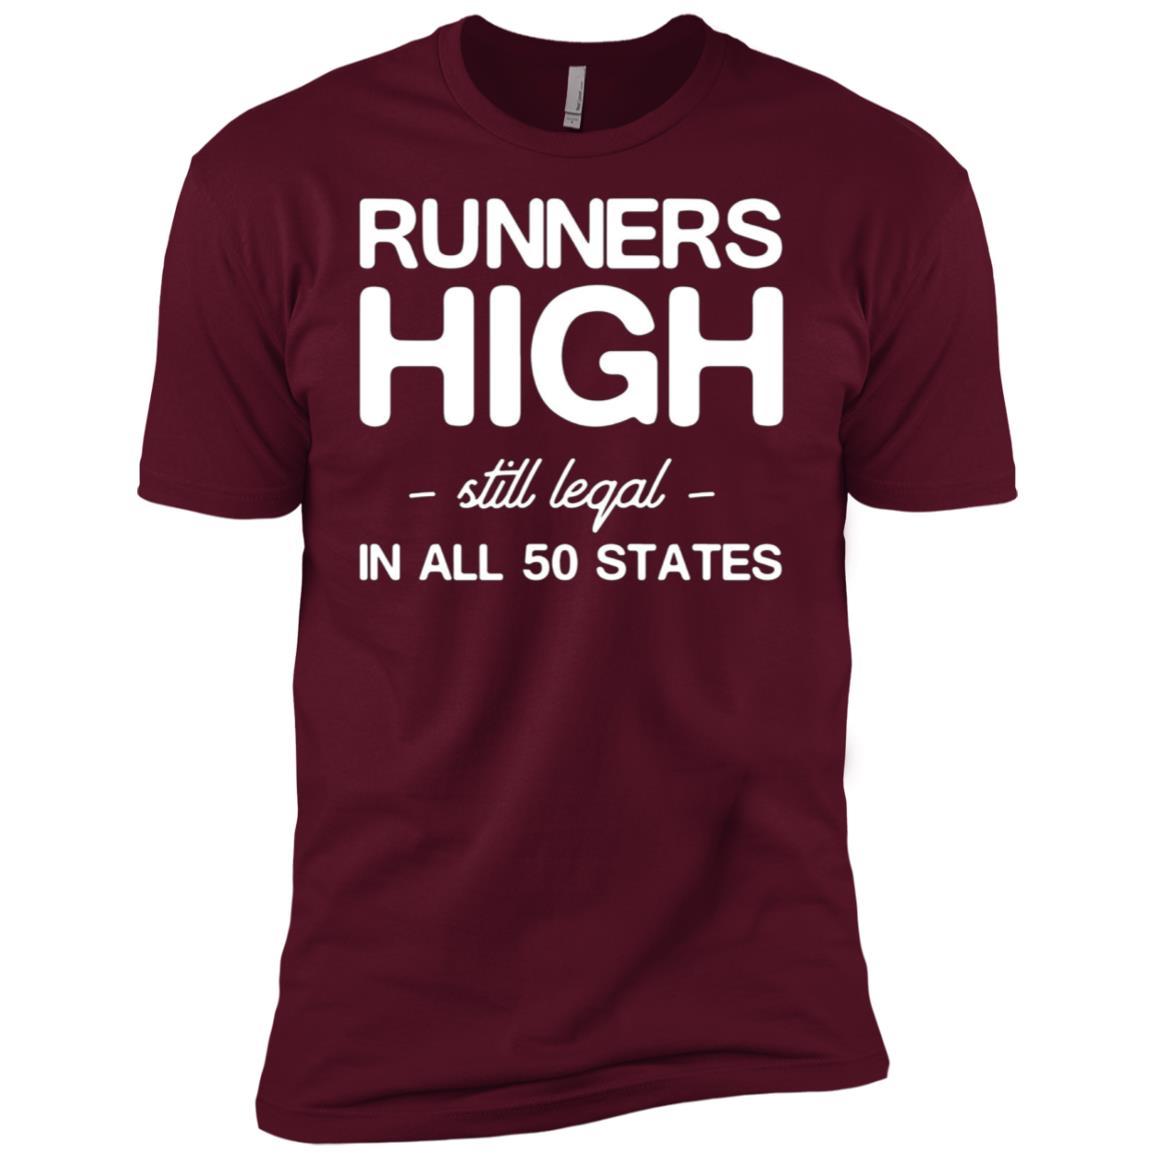 Runners high still legal in all 50 states Men Short Sleeve T-Shirt